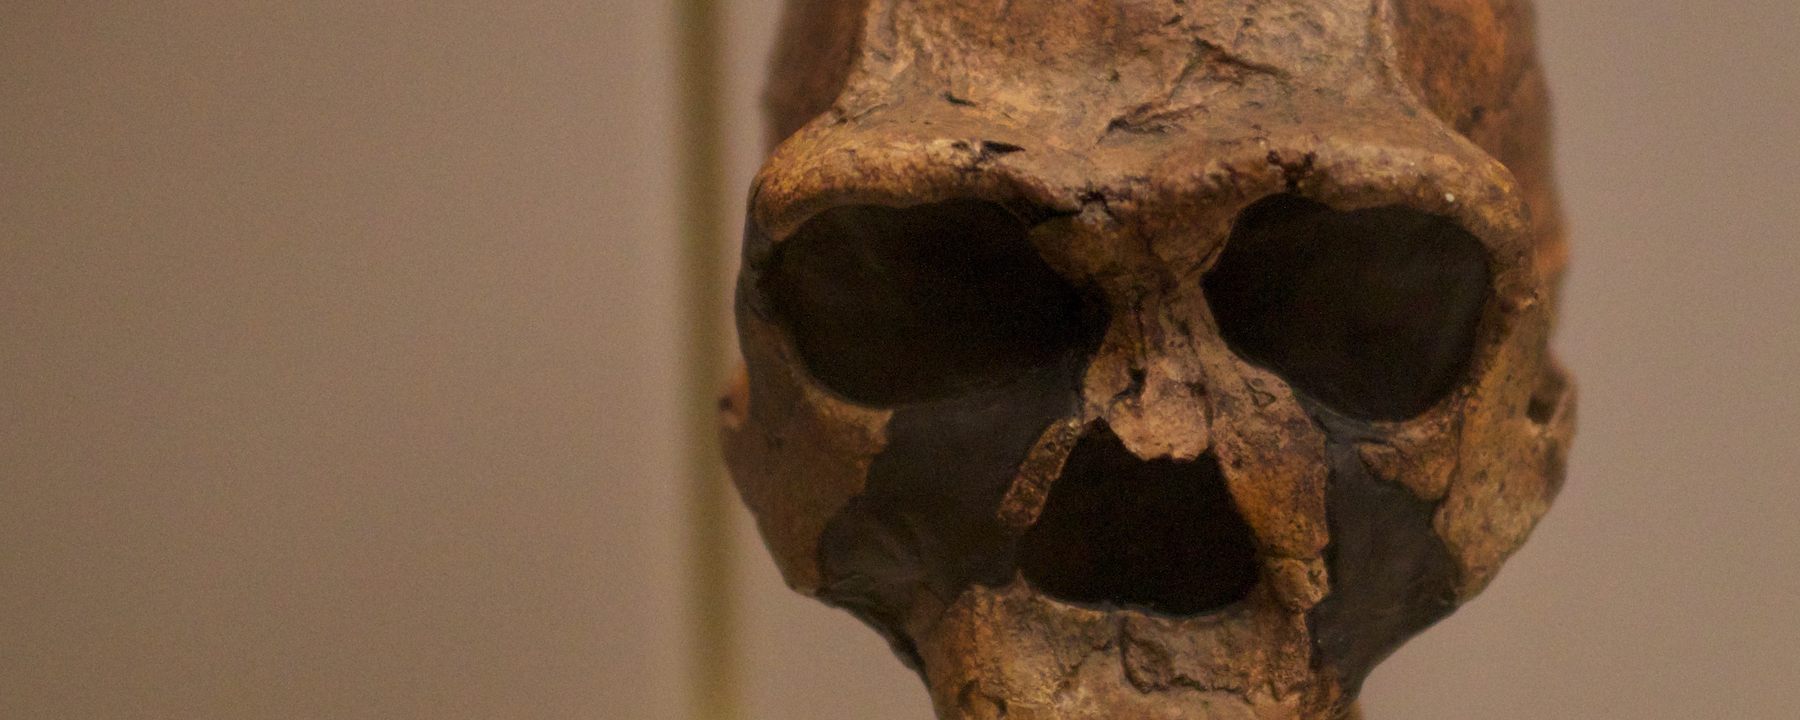 Reanalyzed Fossils Could Be Last Known<em>&nbsp;Homo erectus</em> Specimens